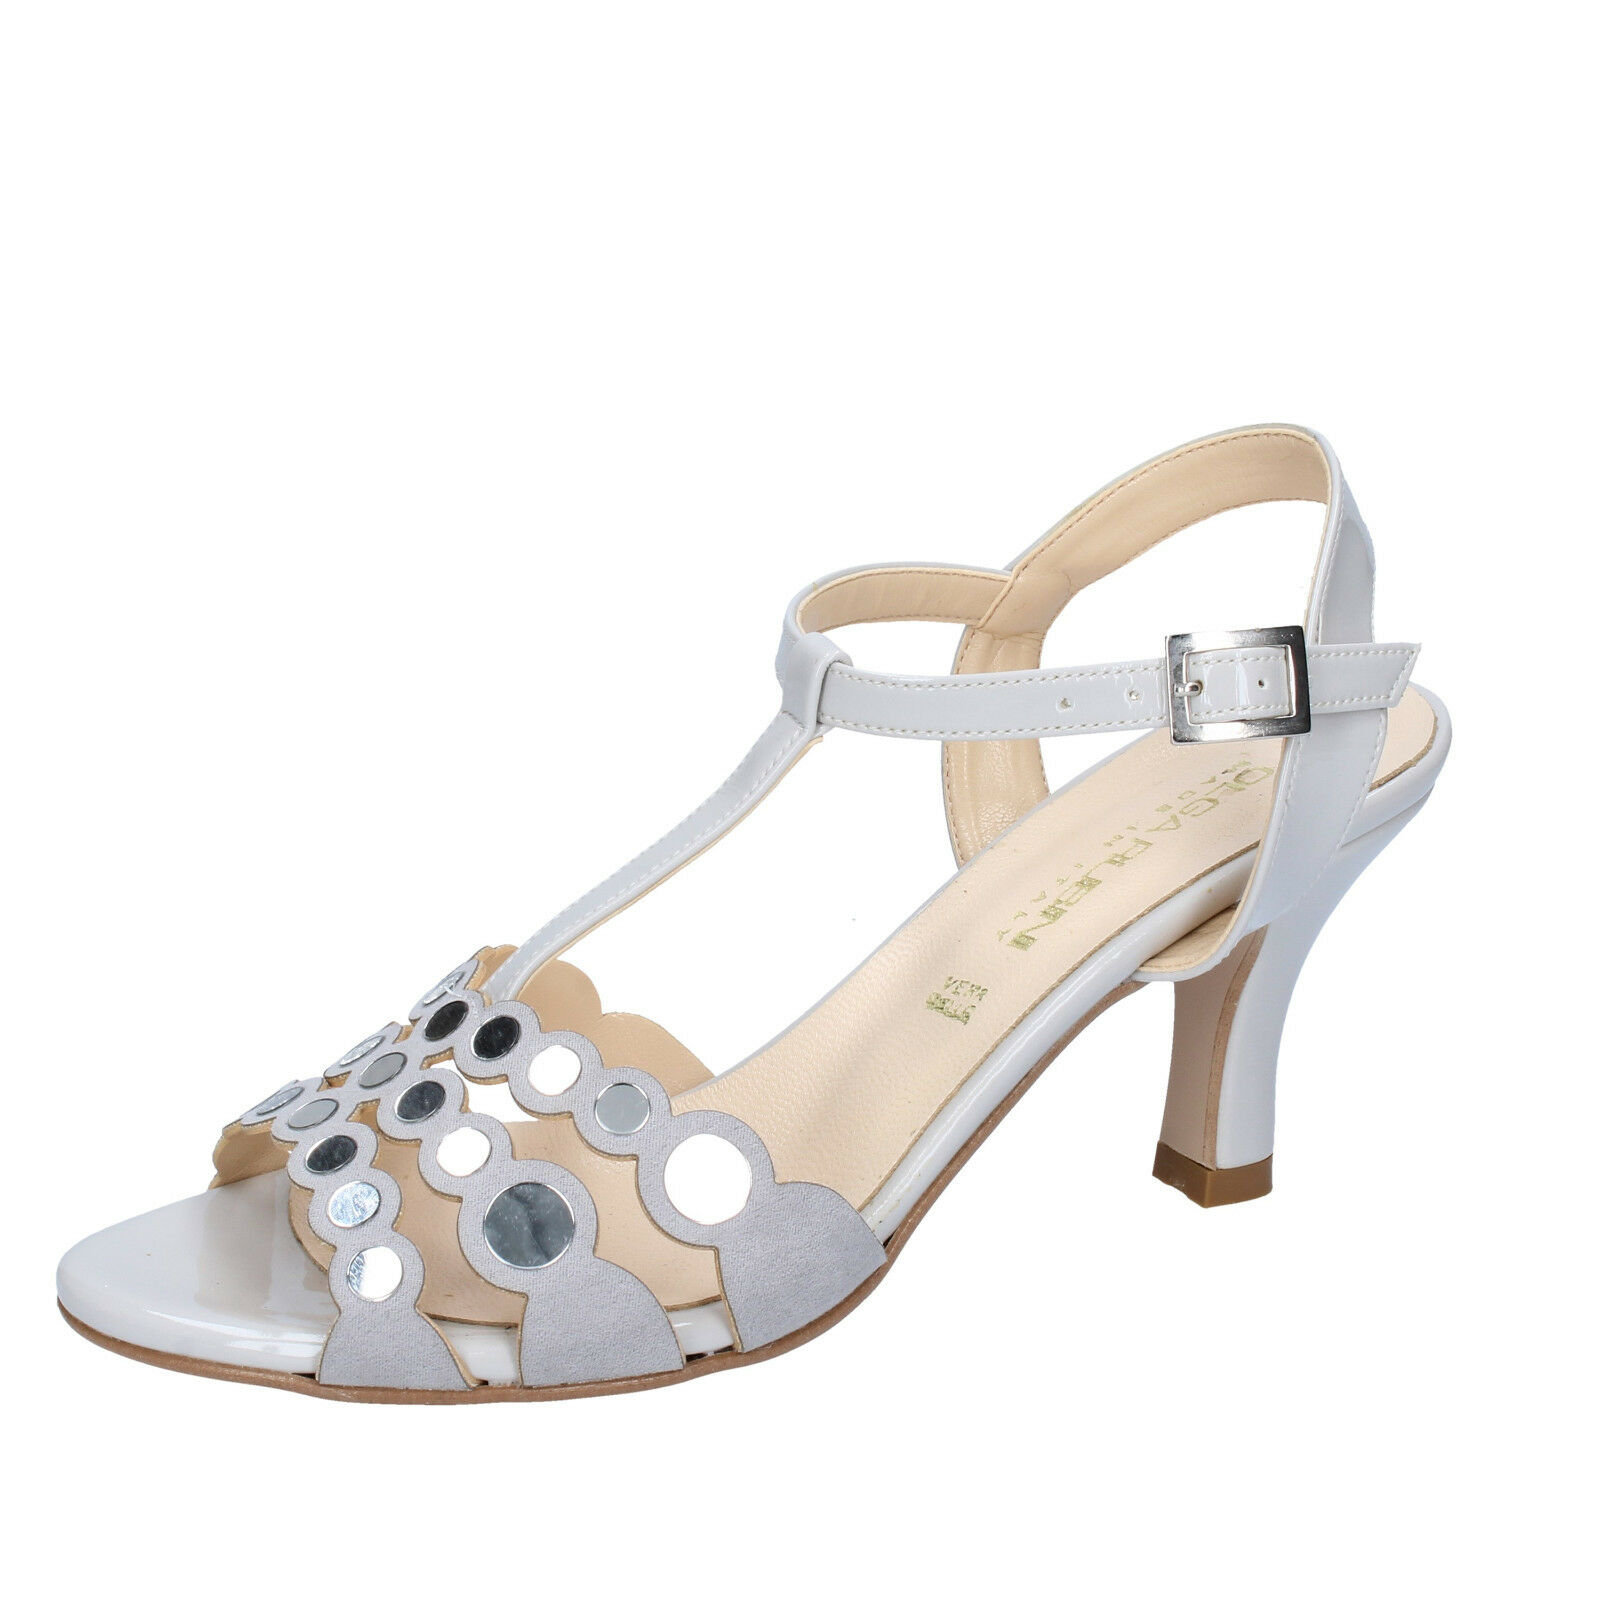 Scarpe donna OLGA grigio RUBINI 40 EU sandali grigio OLGA camoscio vernice BY354-G 21492f